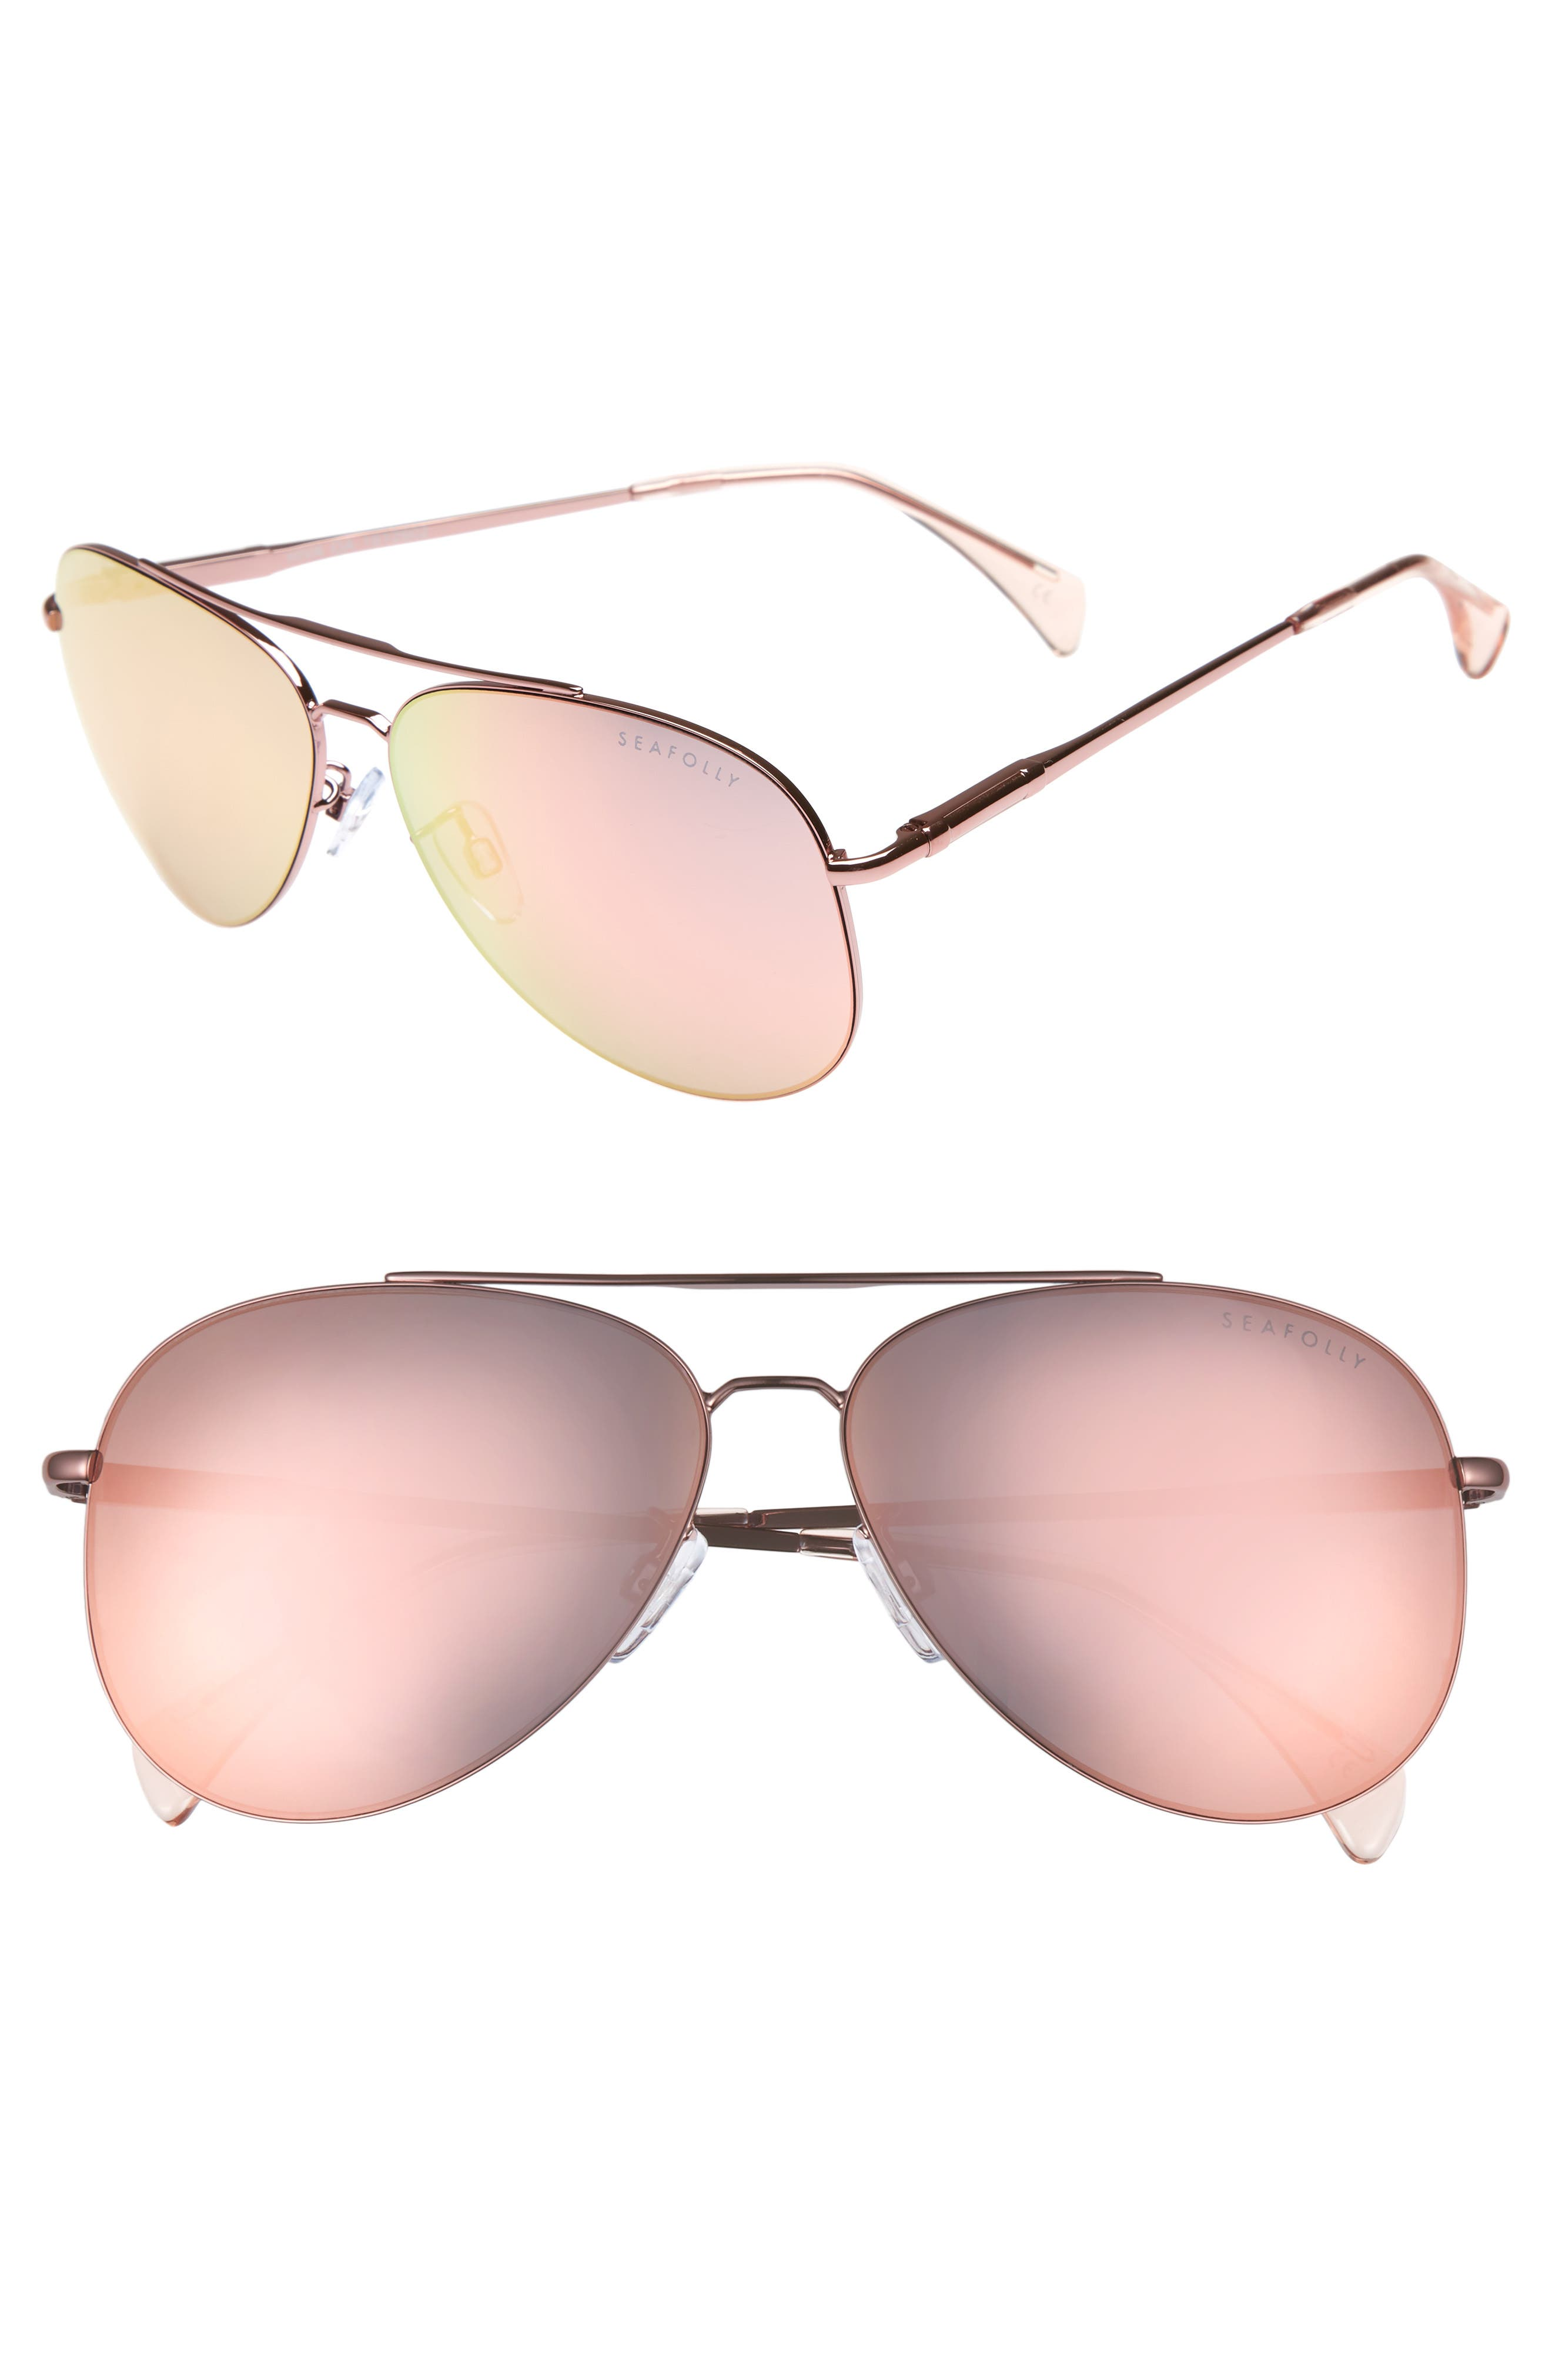 Hiva Oa 58mm Aviator Sunglasses,                         Main,                         color, BALLET